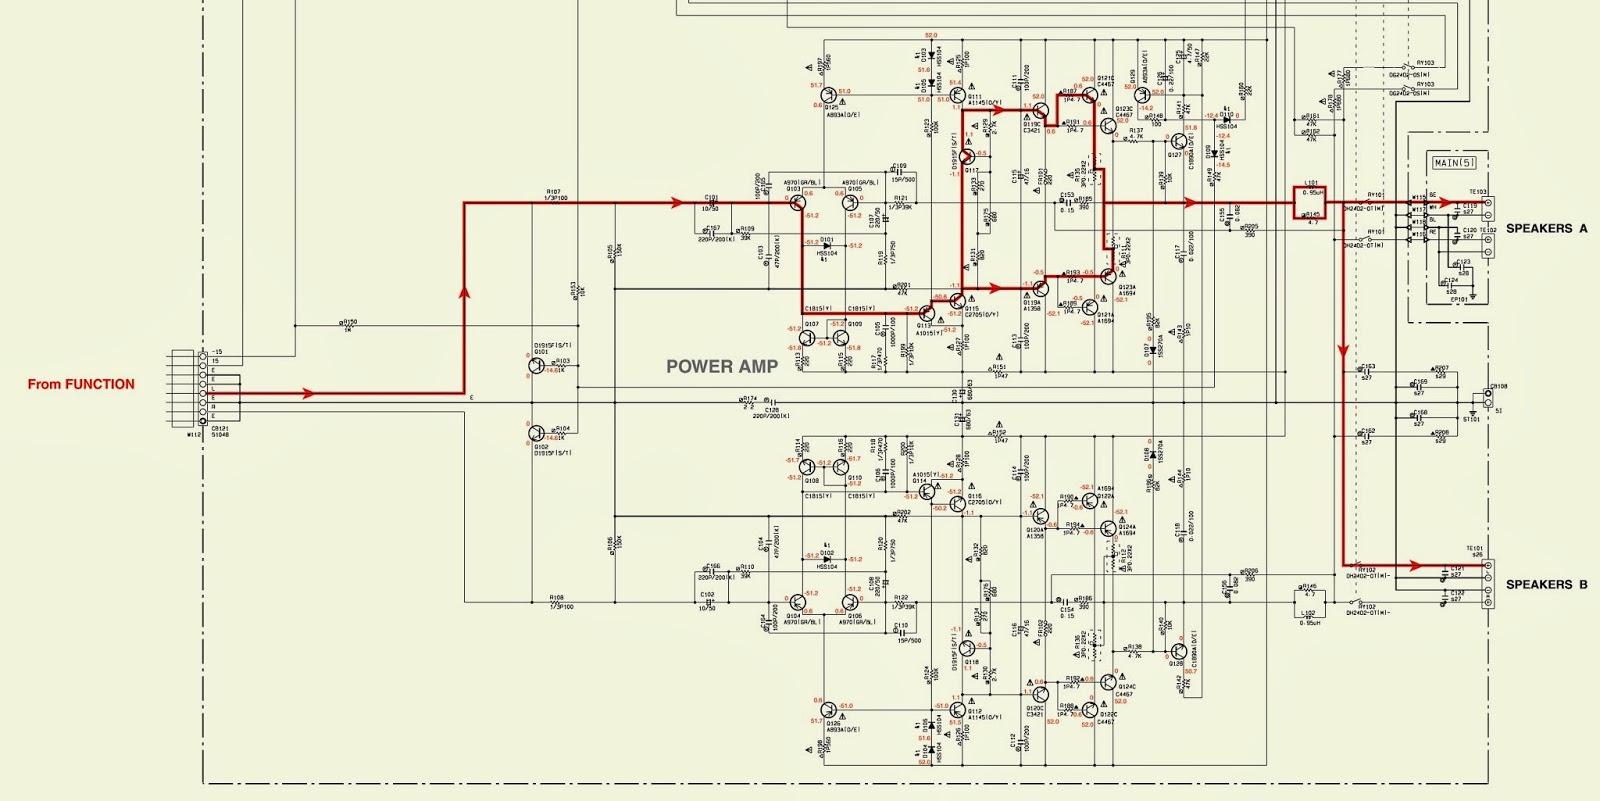 medium resolution of yamaha amp schematic